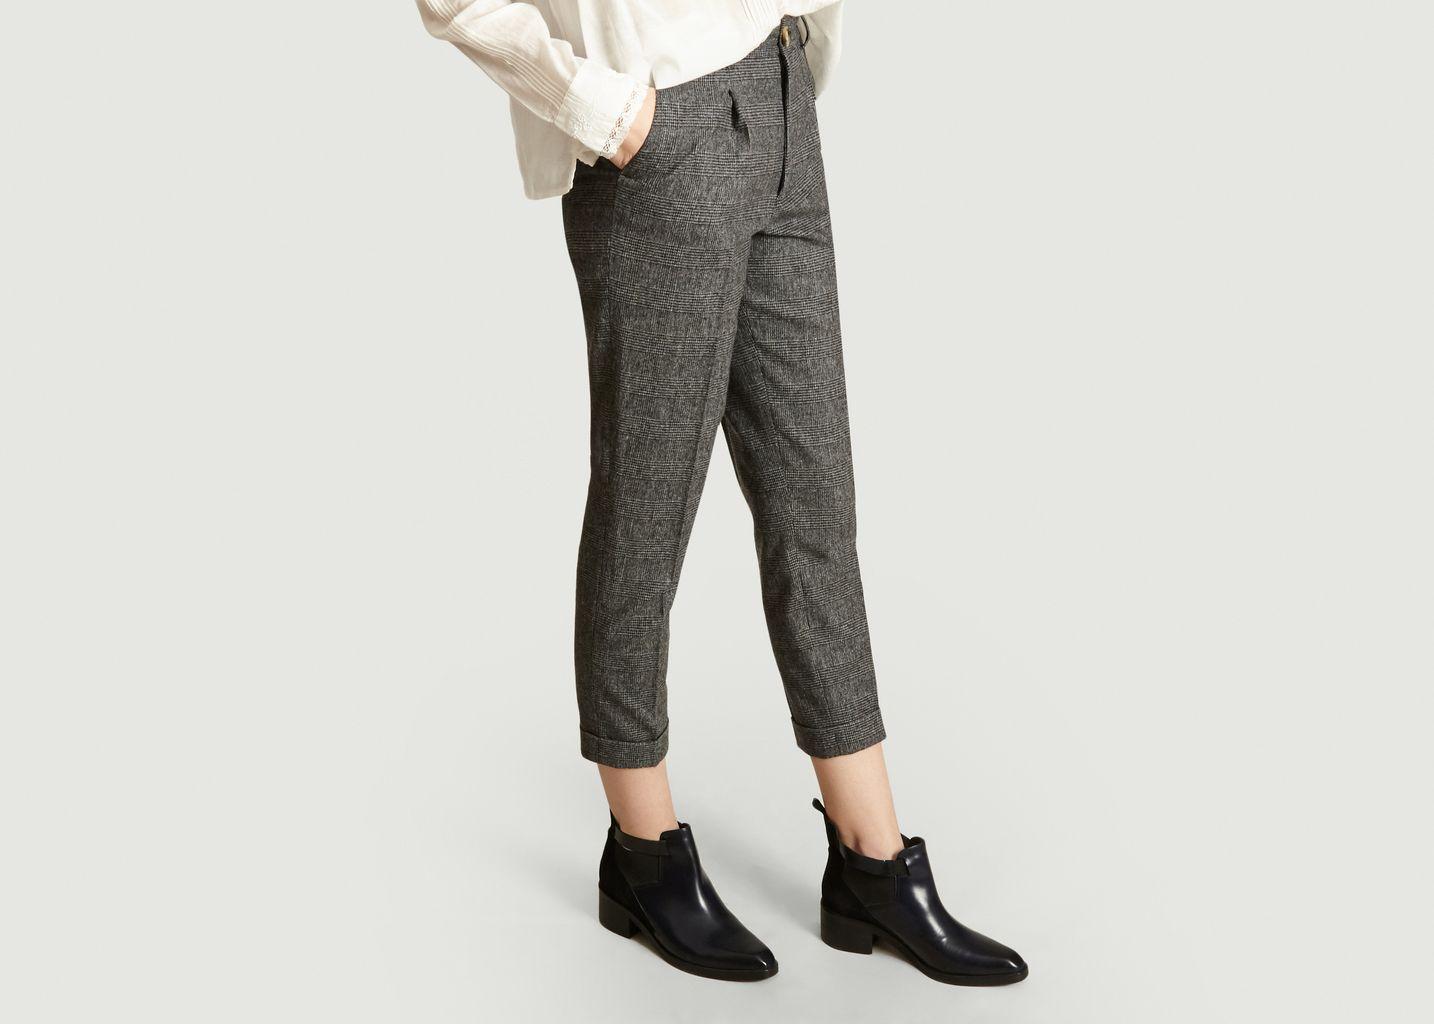 Pantalon Motif Prince-De-Galles Prosper  - Leon & Harper